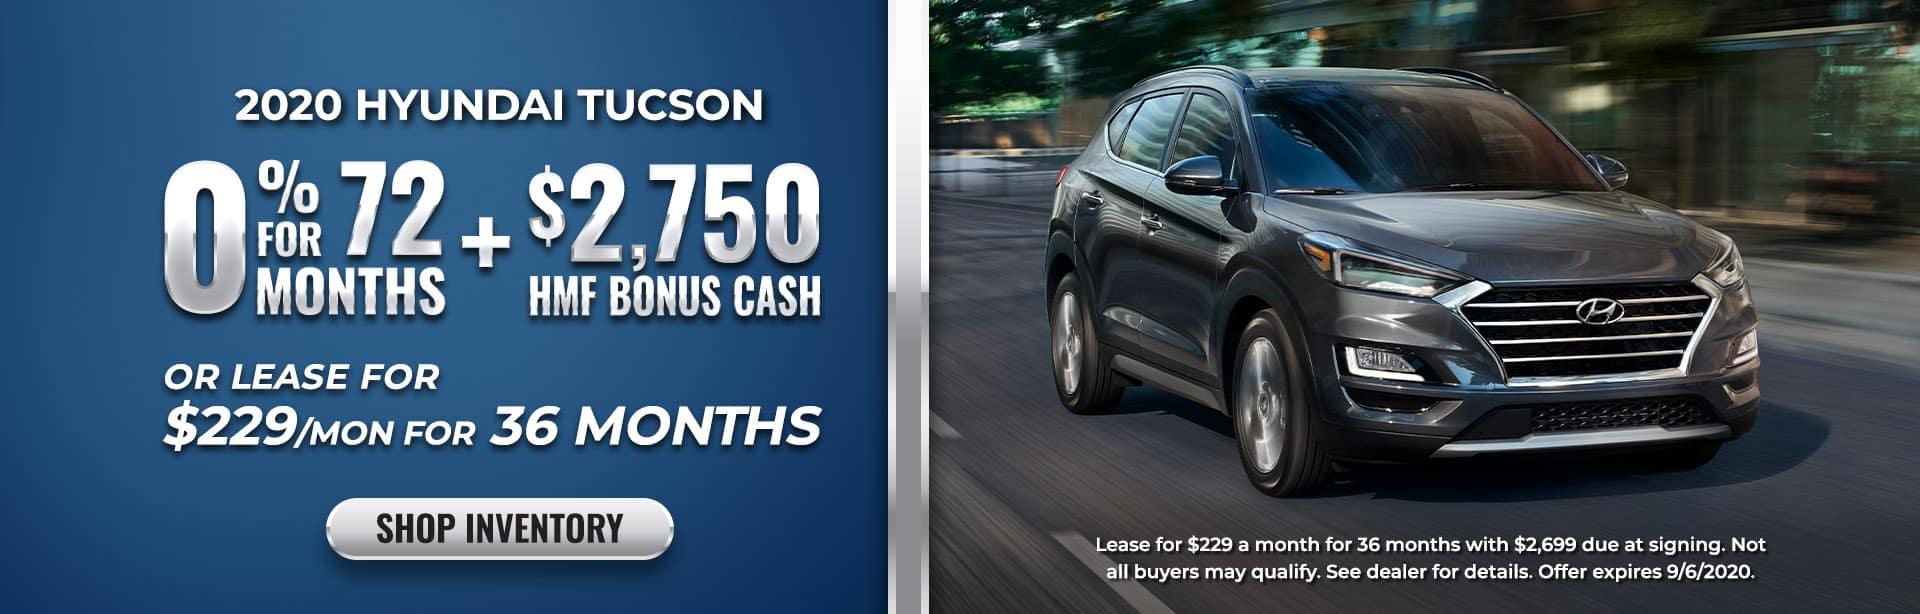 Finance or lease 2020 Tuscon at Ed Voyles Hyundai of Smyrna, GA